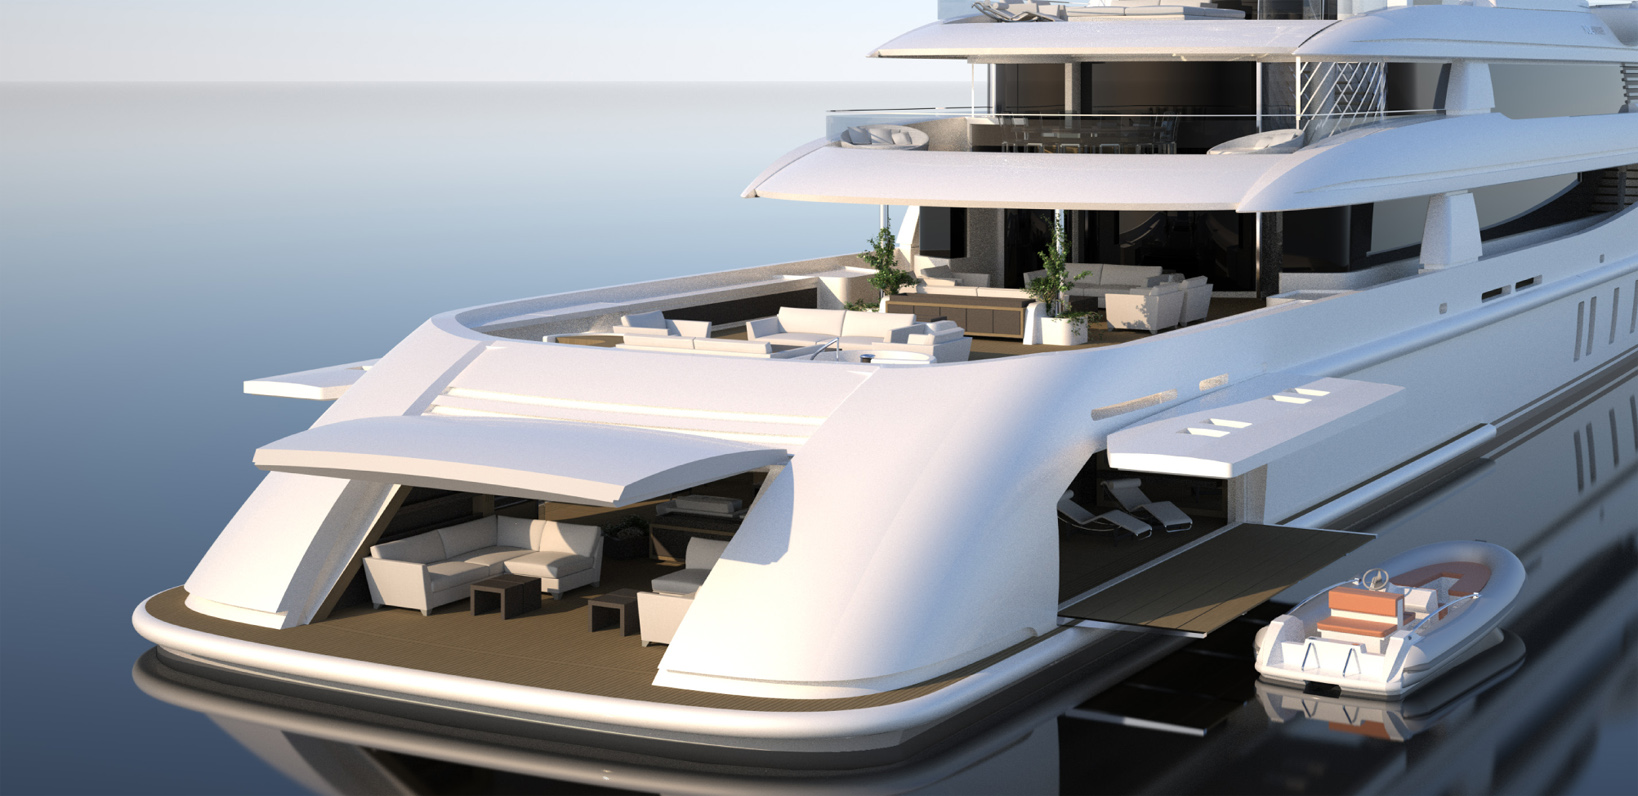 Futuristic Yacht